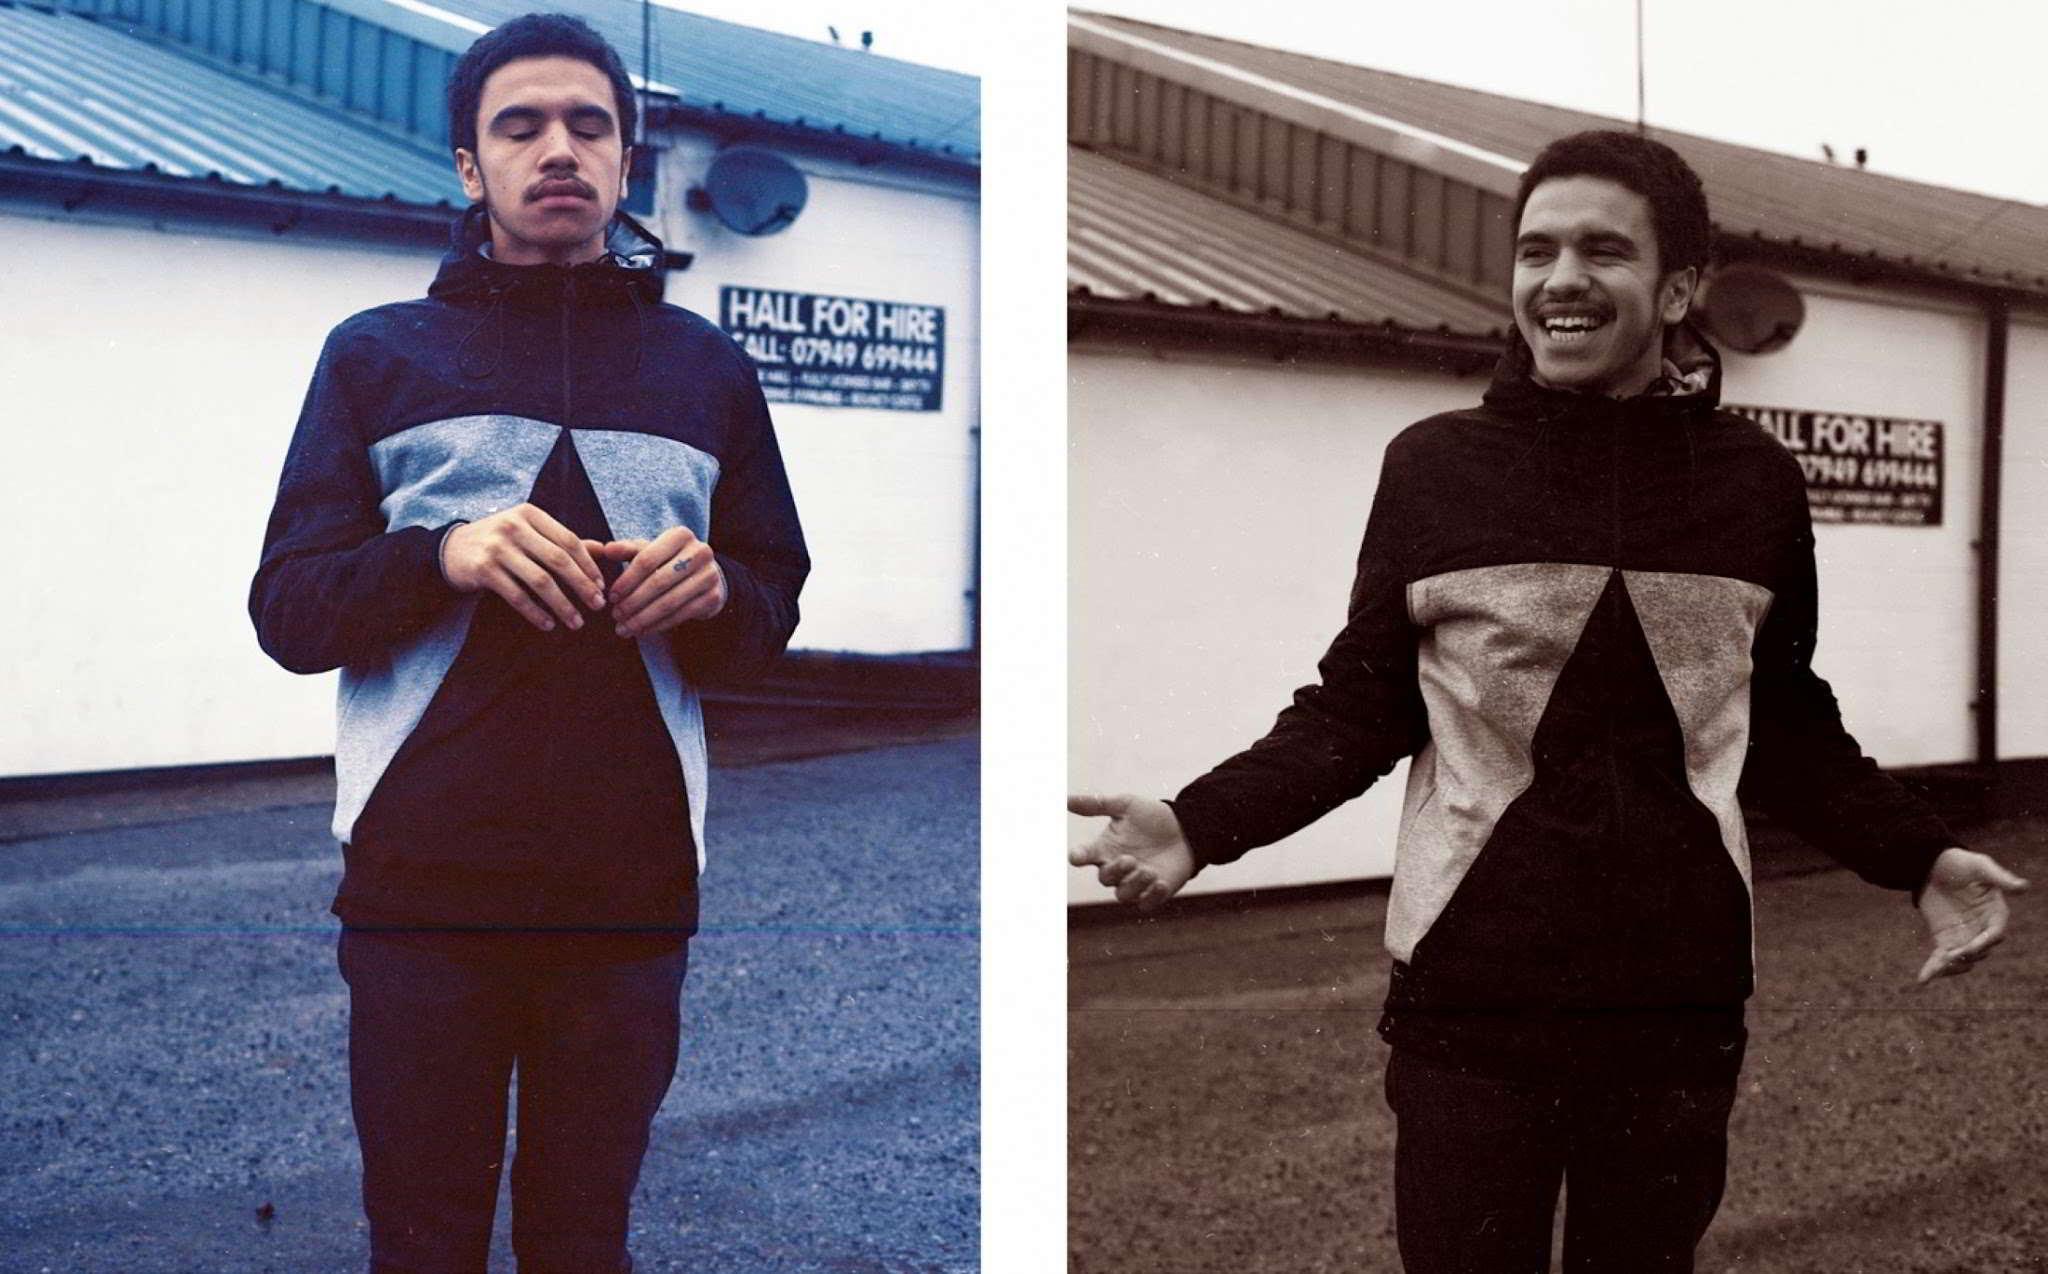 streetwear brasil lft fld outono inverno 2014 05 - LFT FLD Outono/Inverno 2014